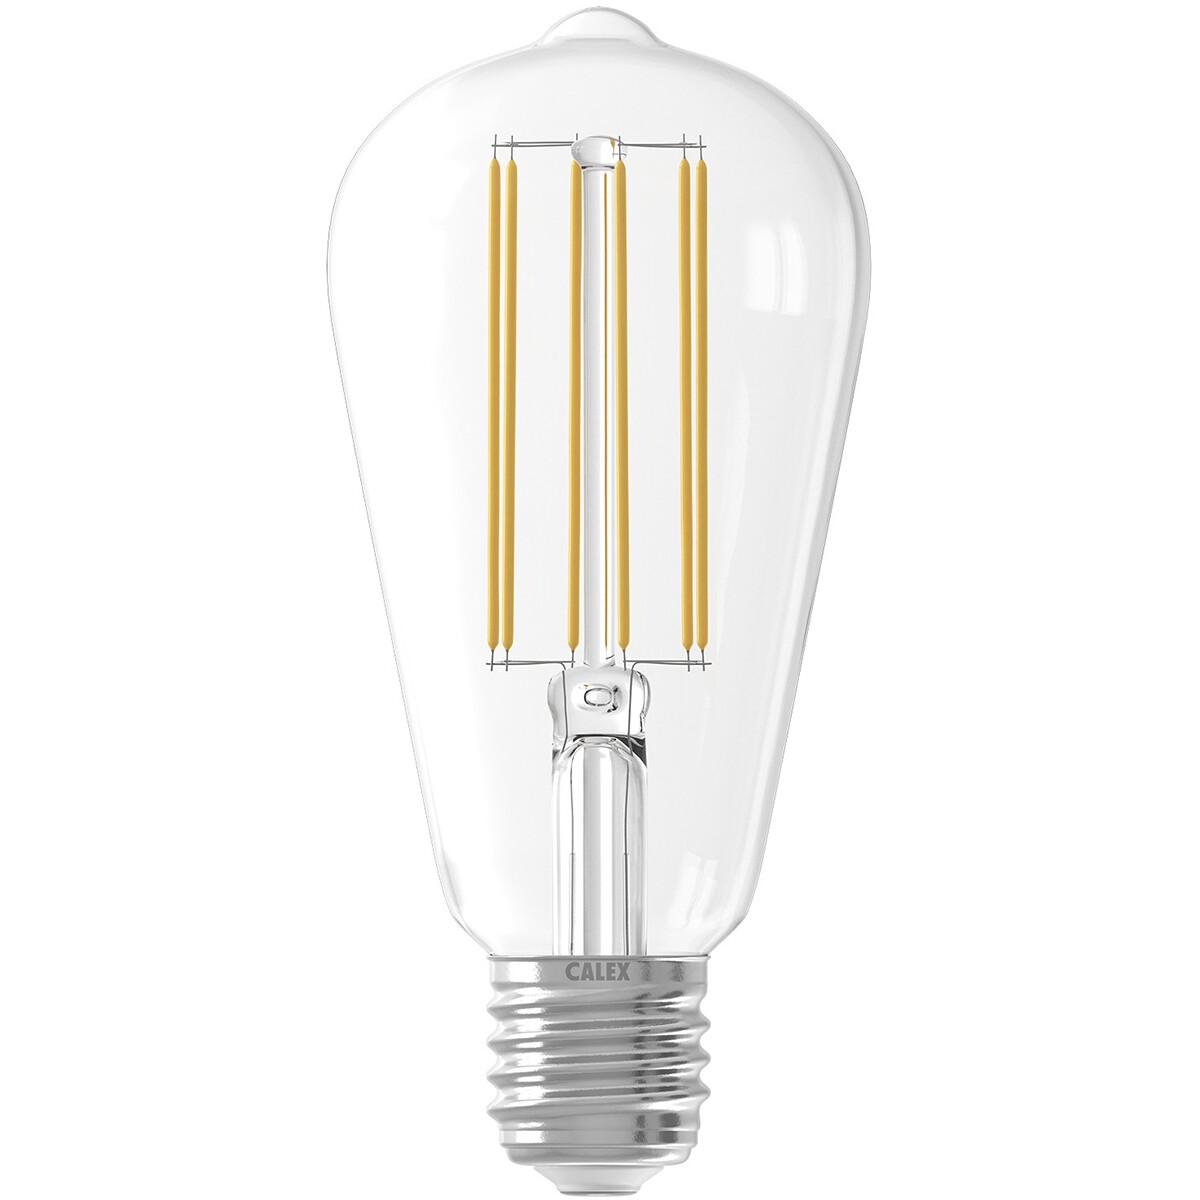 CALEX - LED Lamp - Filament ST64 - E27 Fitting - Dimbaar - 4W - Warm Wit 2300K - Transparant Helder